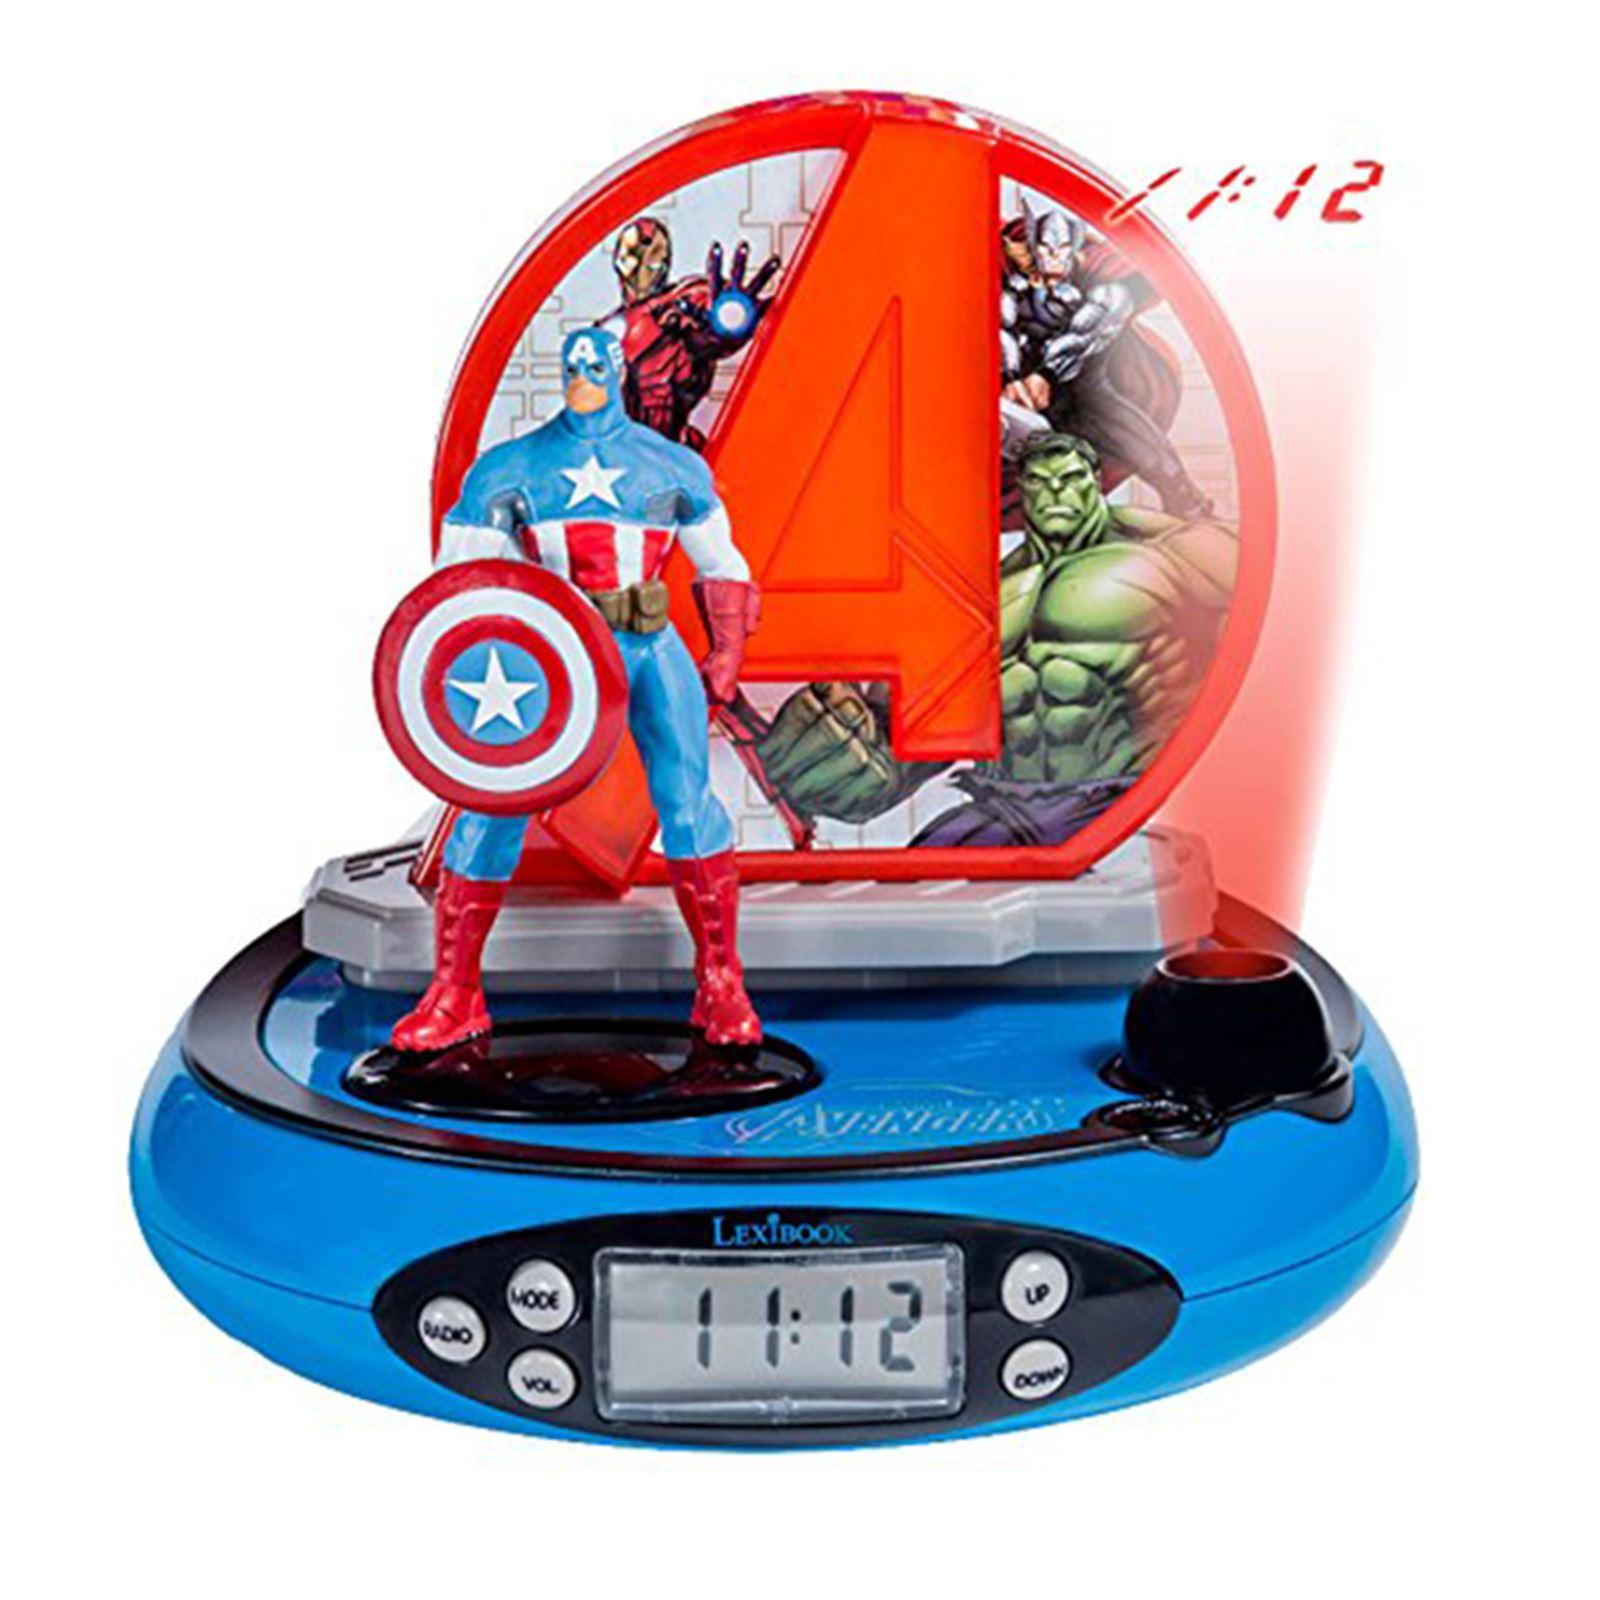 radio projector alarm clock childrens room avengers cars princess spiderman ebay. Black Bedroom Furniture Sets. Home Design Ideas